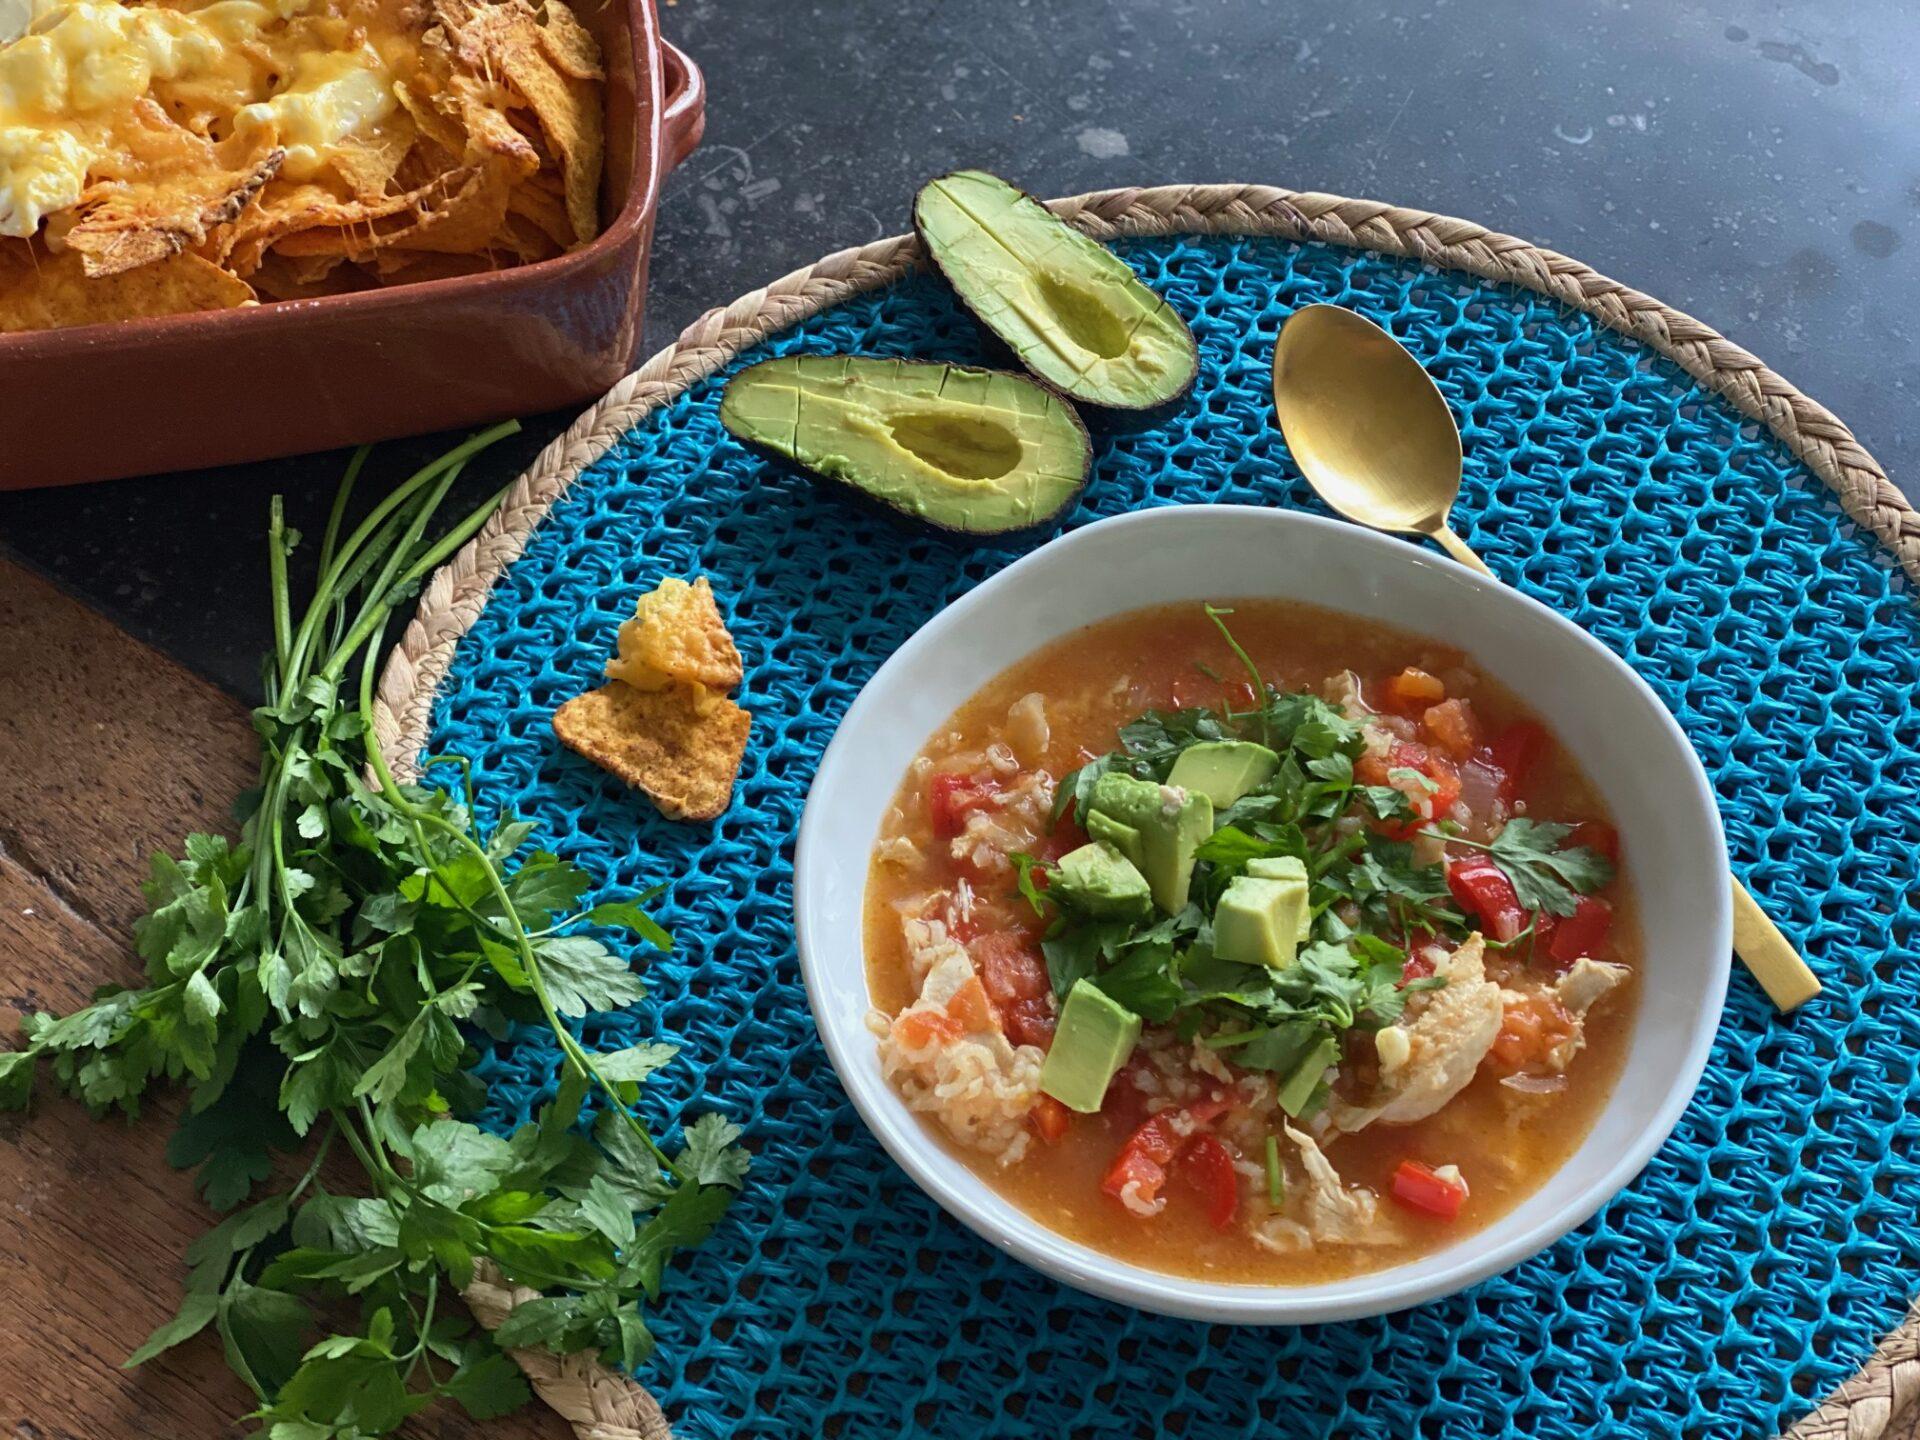 Mexicaanse kippensoep recept met frisse groente zoals tomaat, paprika en avocado - Foodblog Foodinista